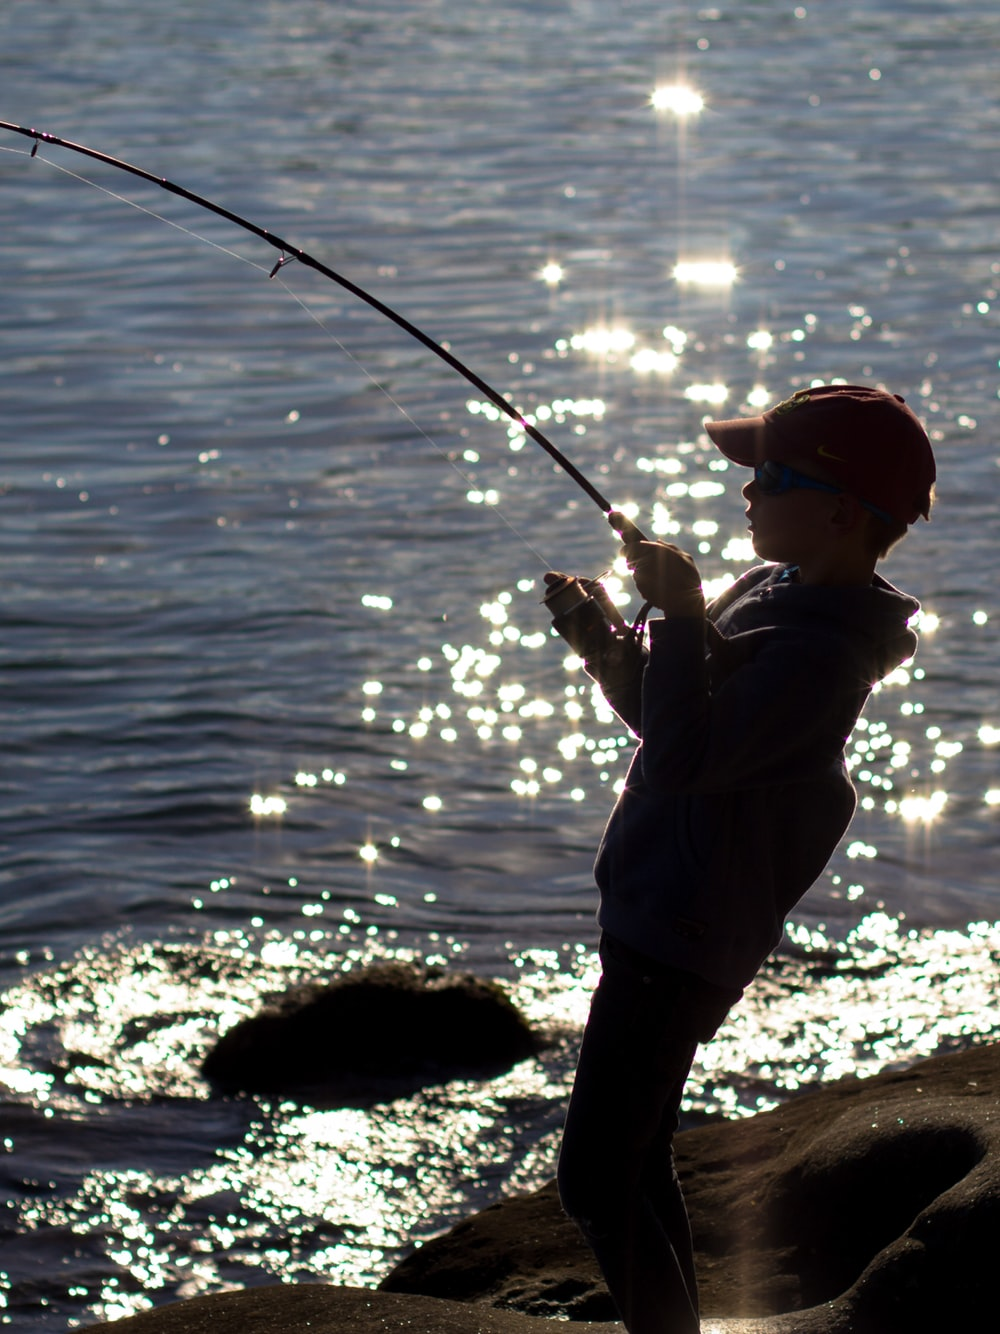 silhouette of boy fishing on shore